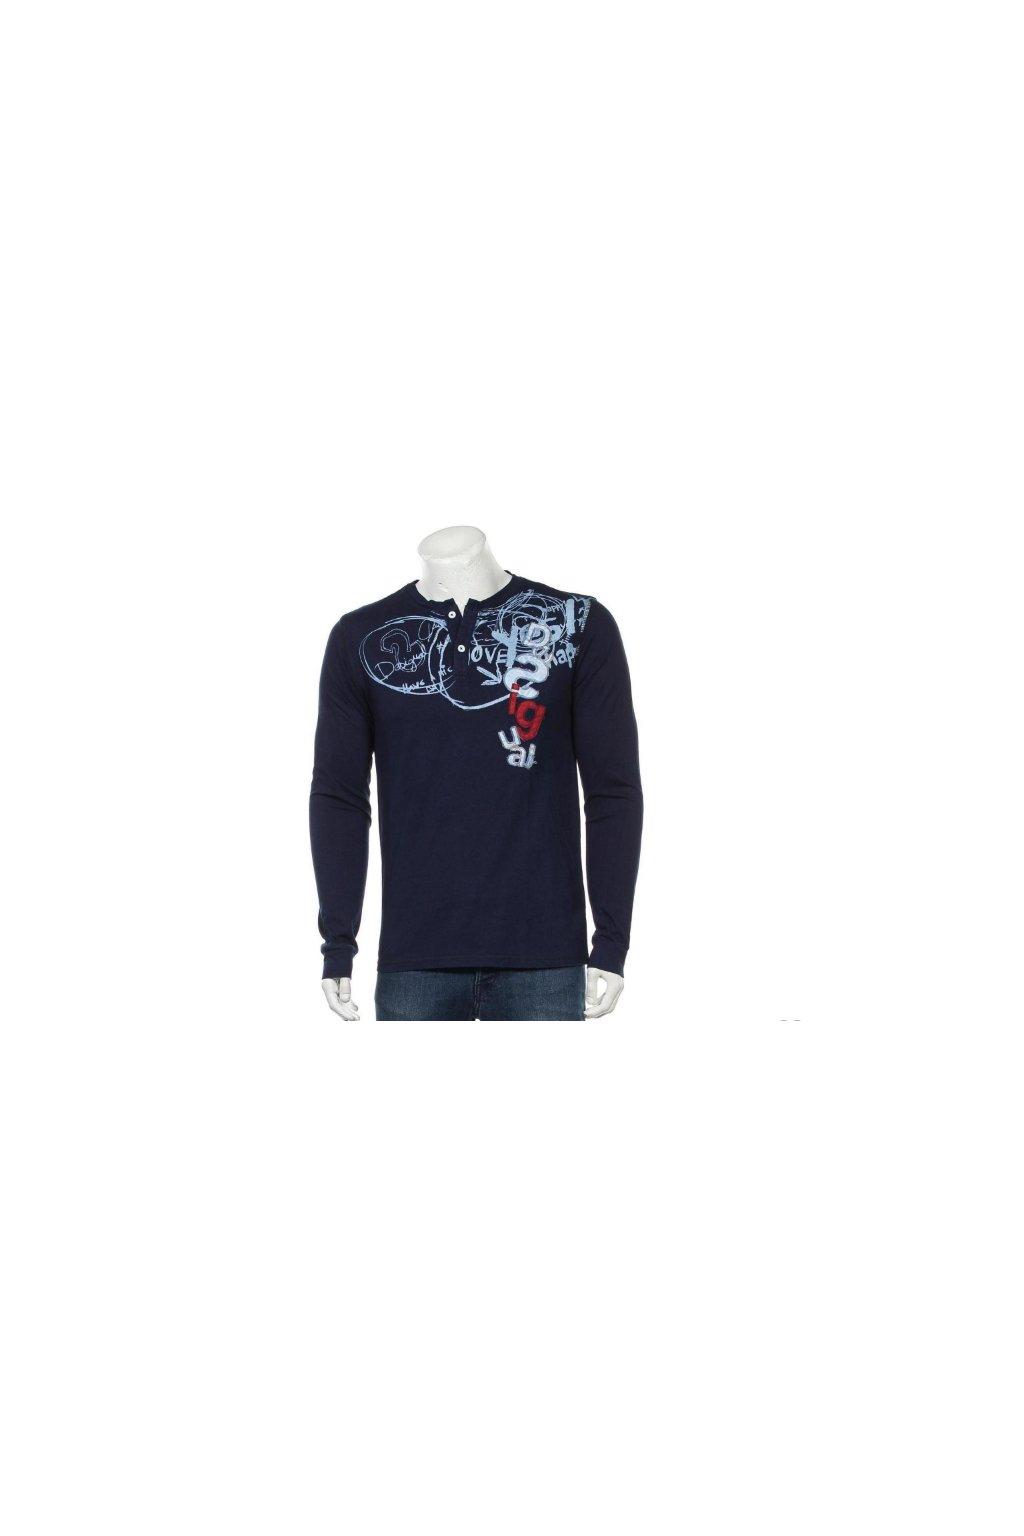 Pánské tričko Desigual 59T14C2/5000